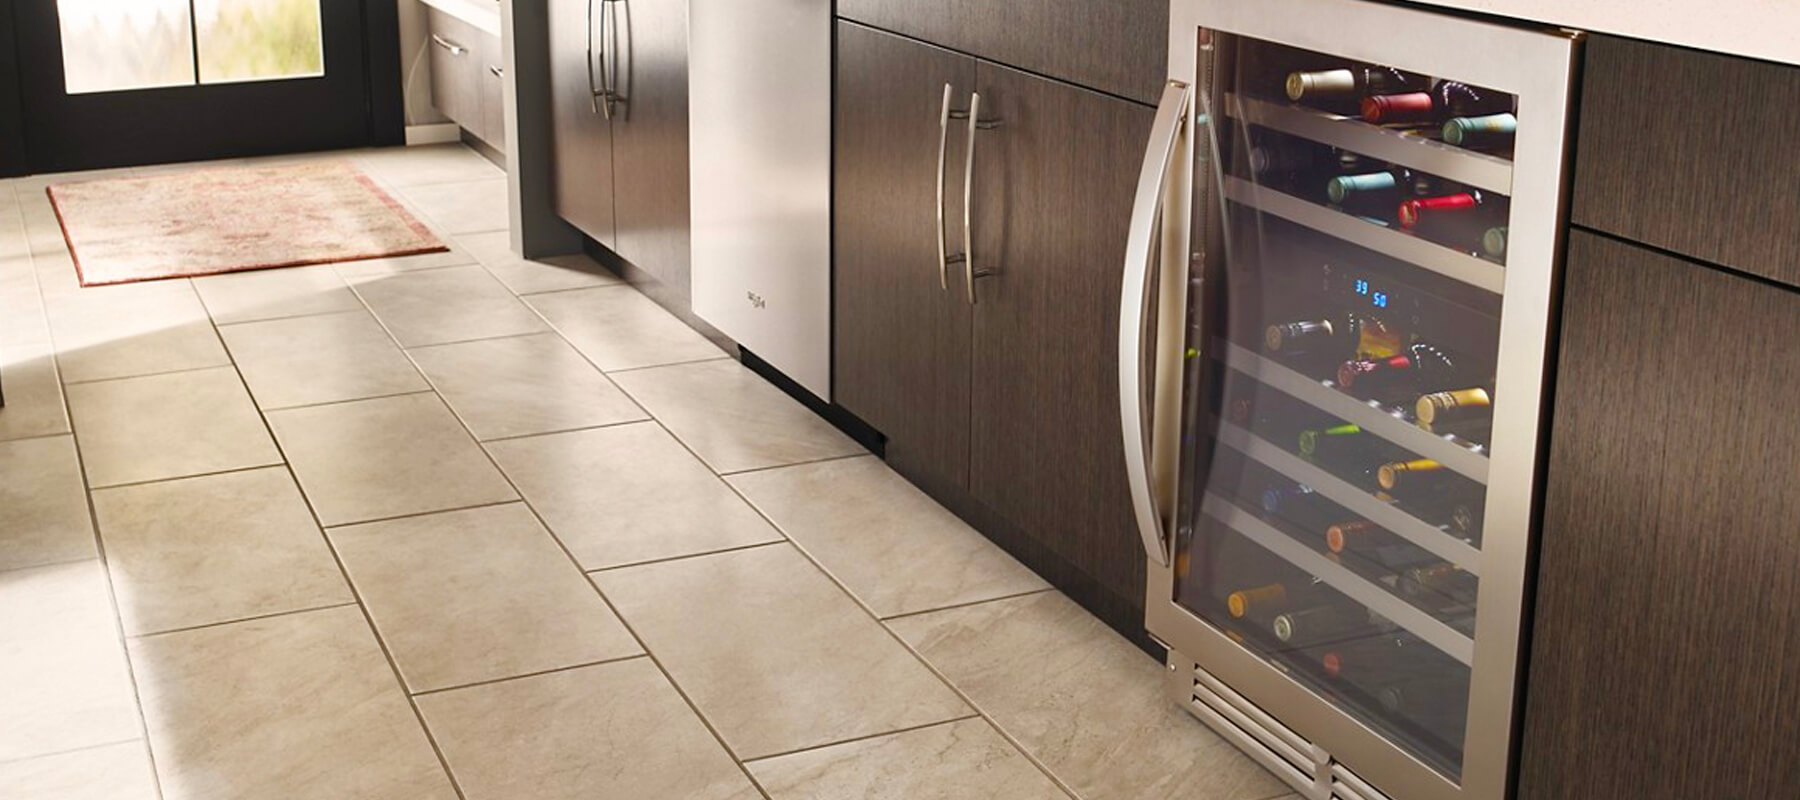 Built in Wine Refrigerator Undercounter Poway | Built-in Refrigerator Repair